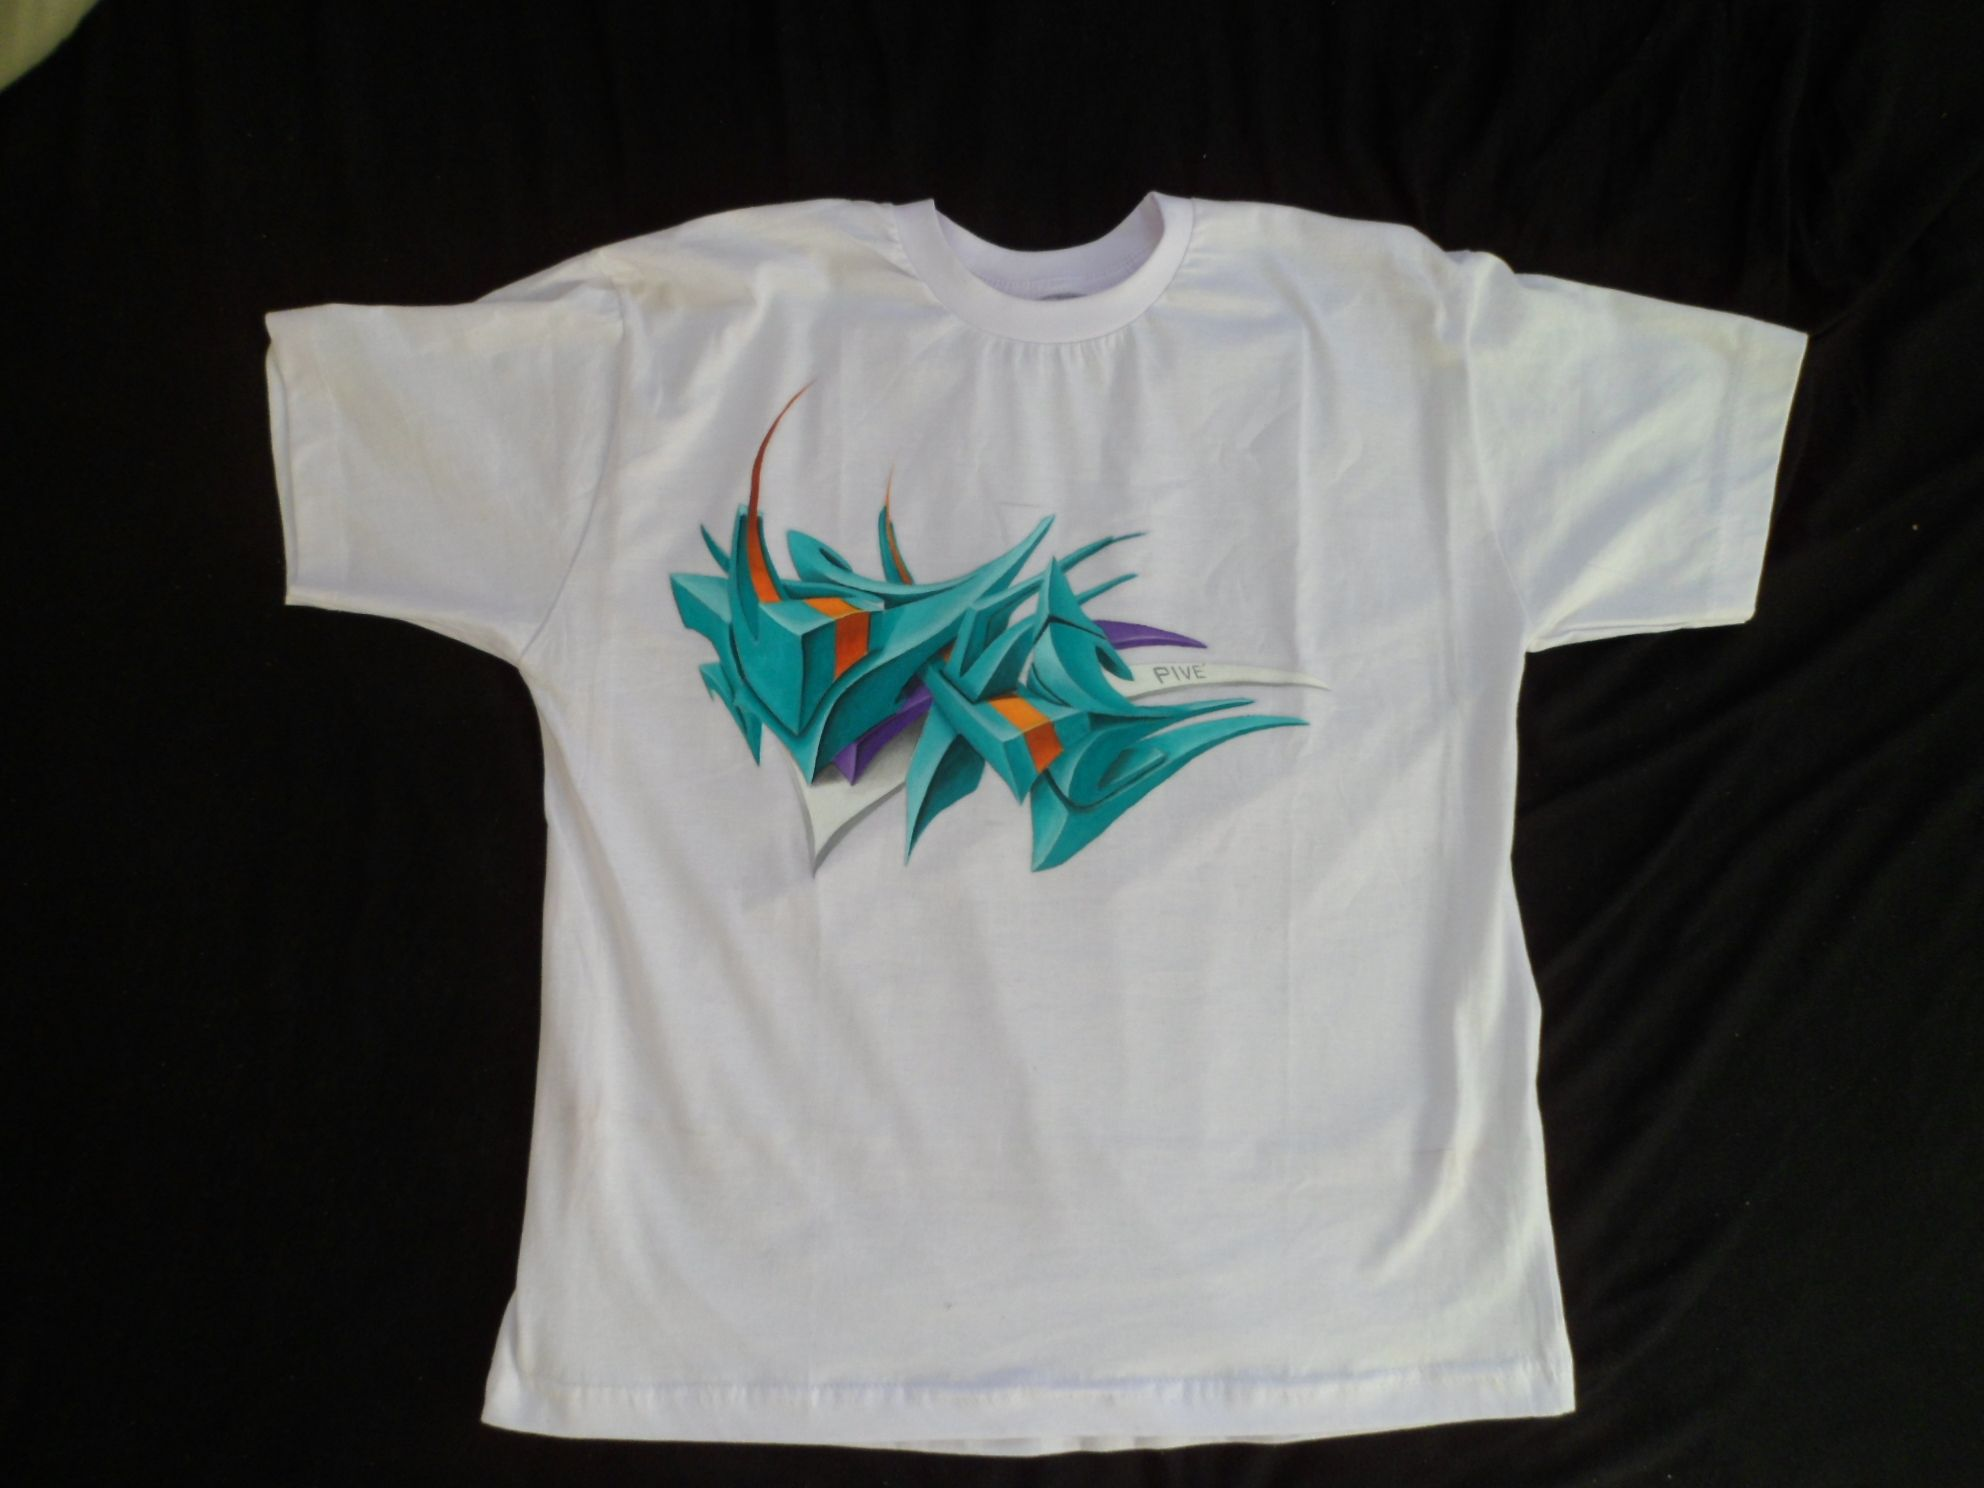 Pivé Camisetas customizadas, sob encomenda.